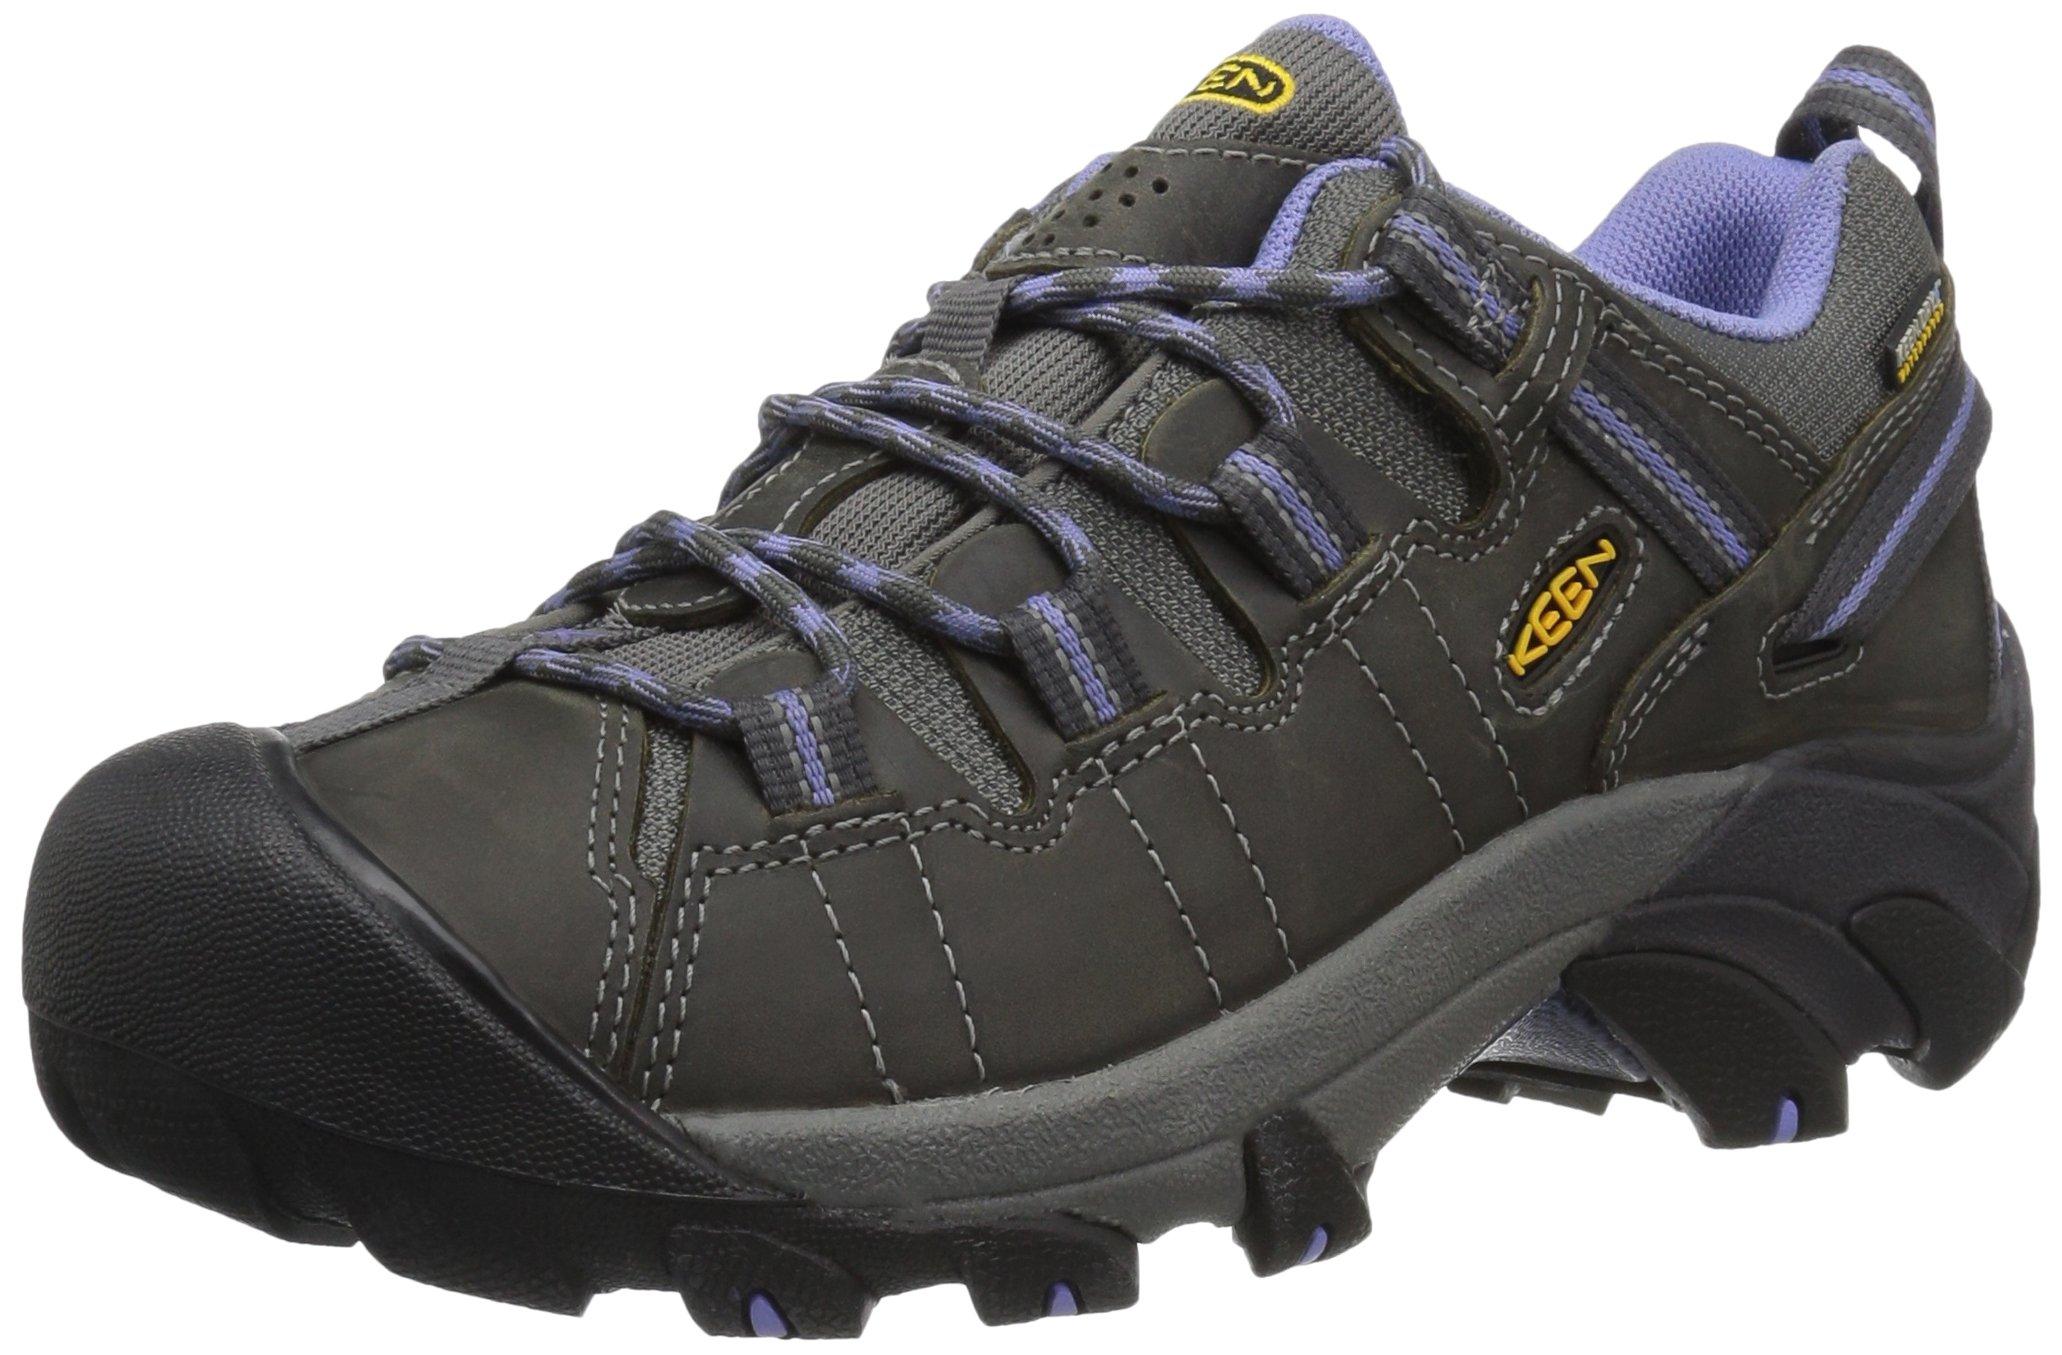 KEEN Women's Targhee II Outdoor Shoe, Magnet/Periwinkle, 7.5 M US